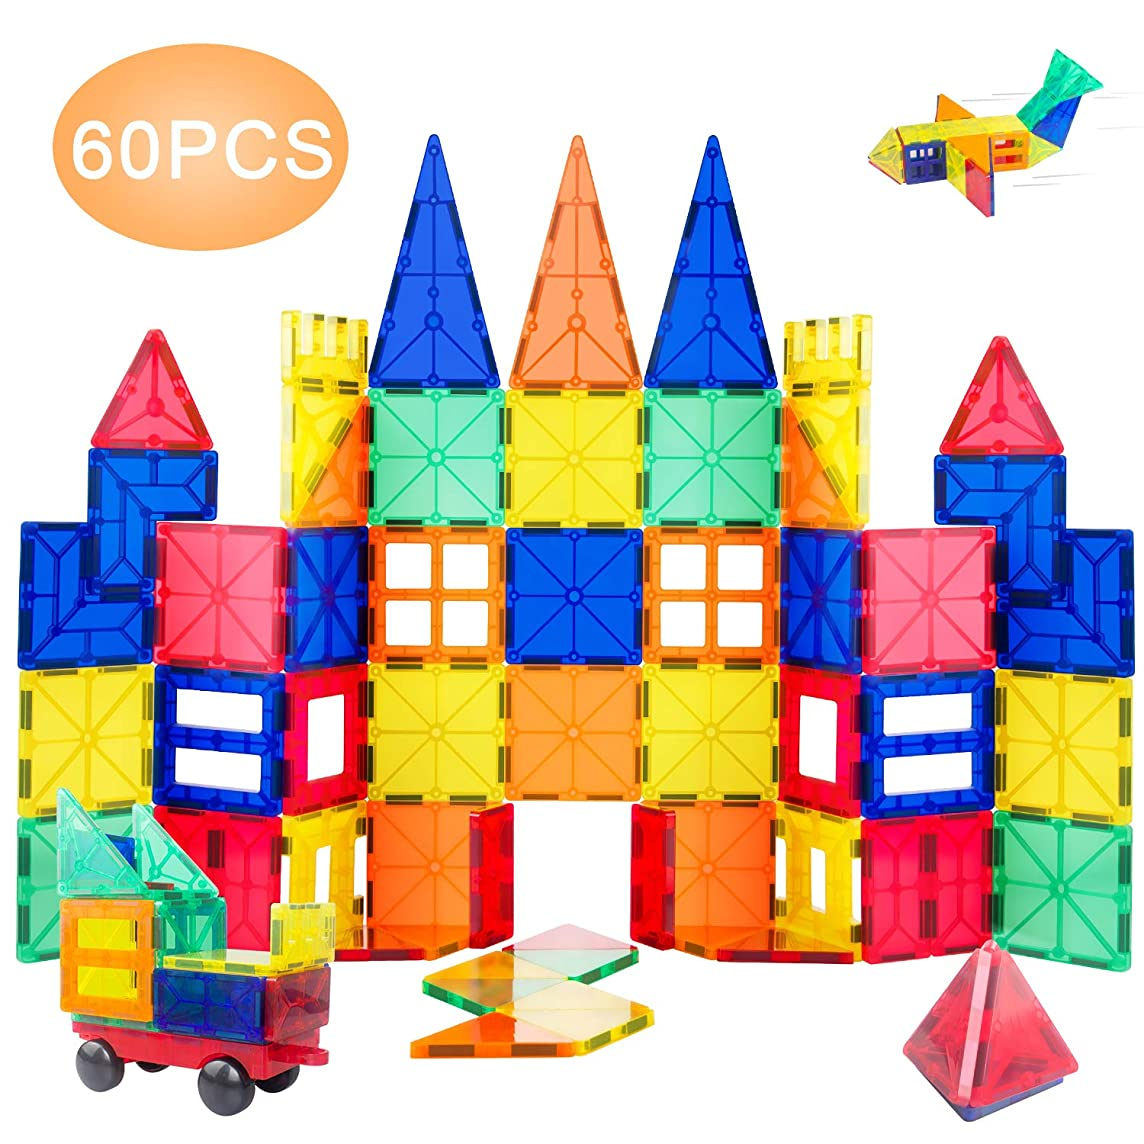 VCANNY Magnetic Blocks, Magnetic Building Blocks Set for Boys/Girls, Magnetic Tiles Educational STEM Toys for Kids/Toddlers, 60 Piece